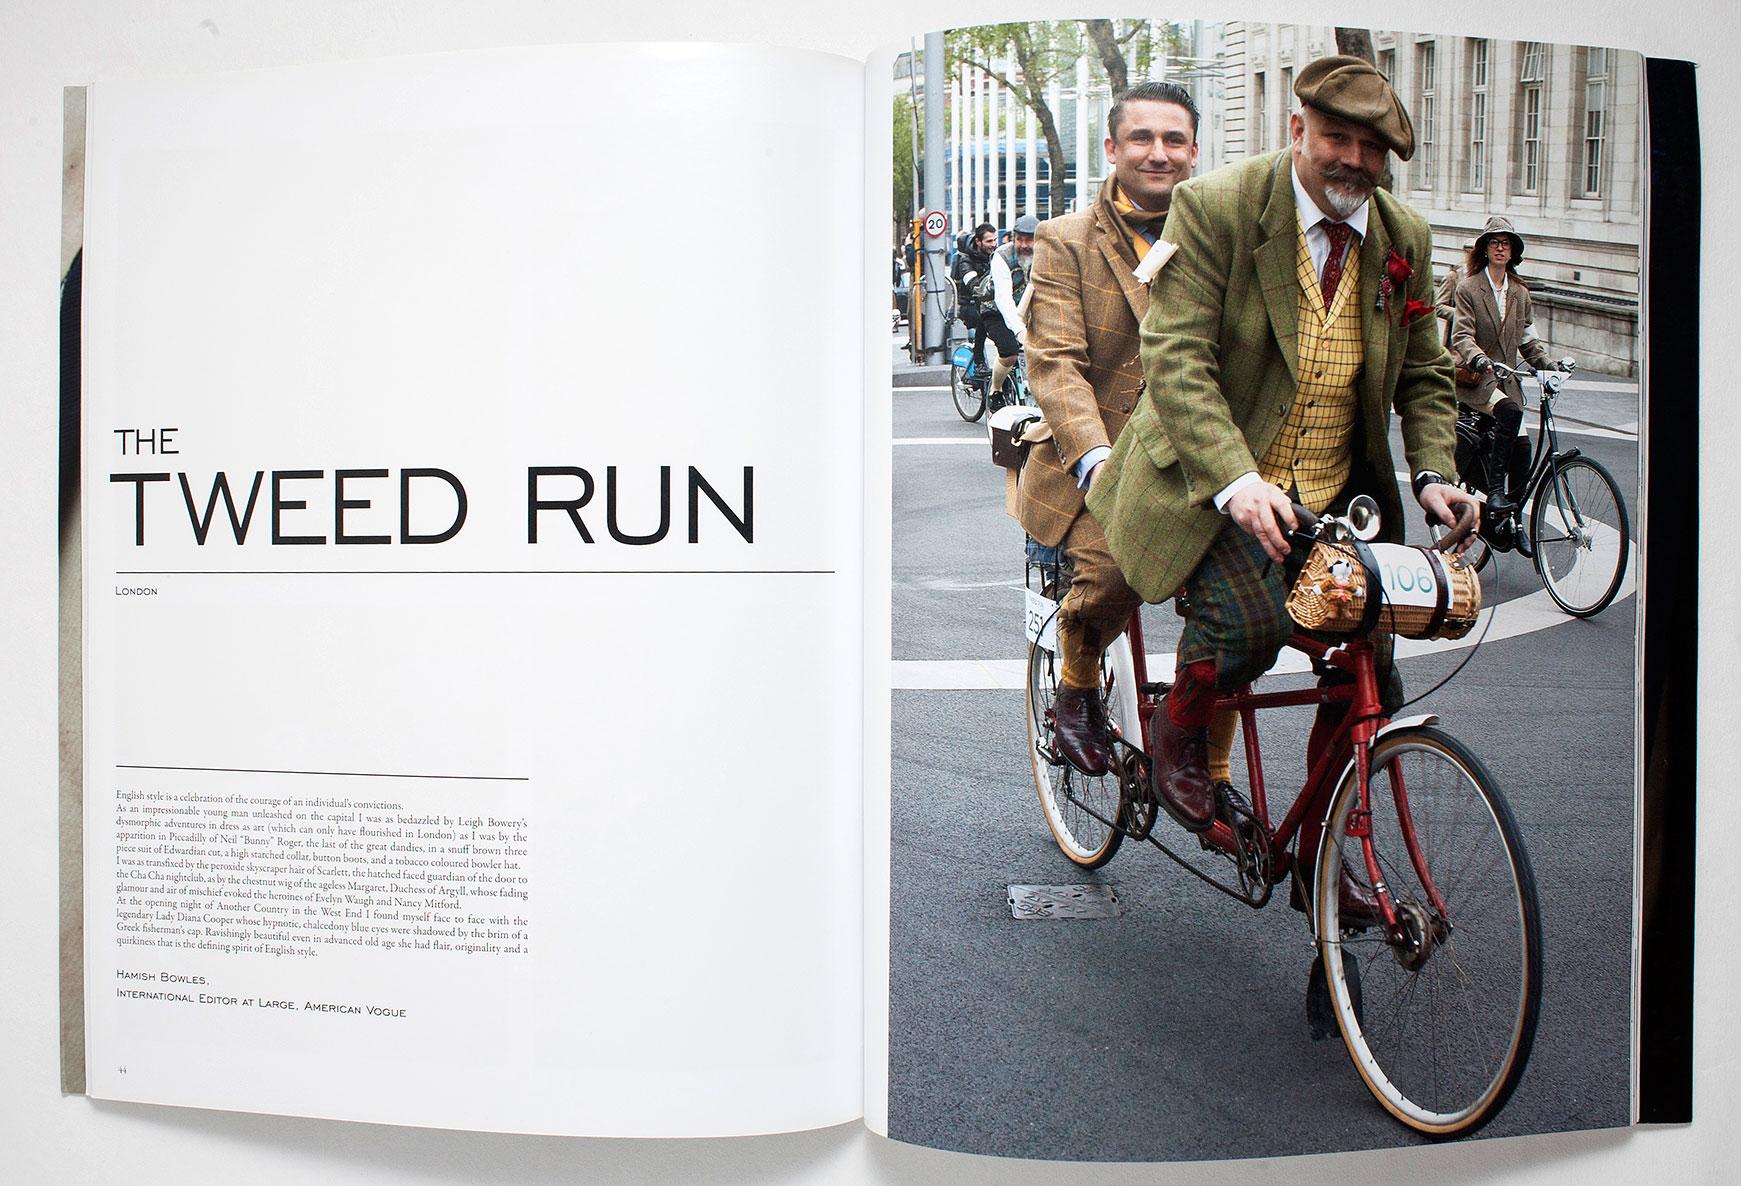 epm-print-management-bristol-fashion-books-4.jpg